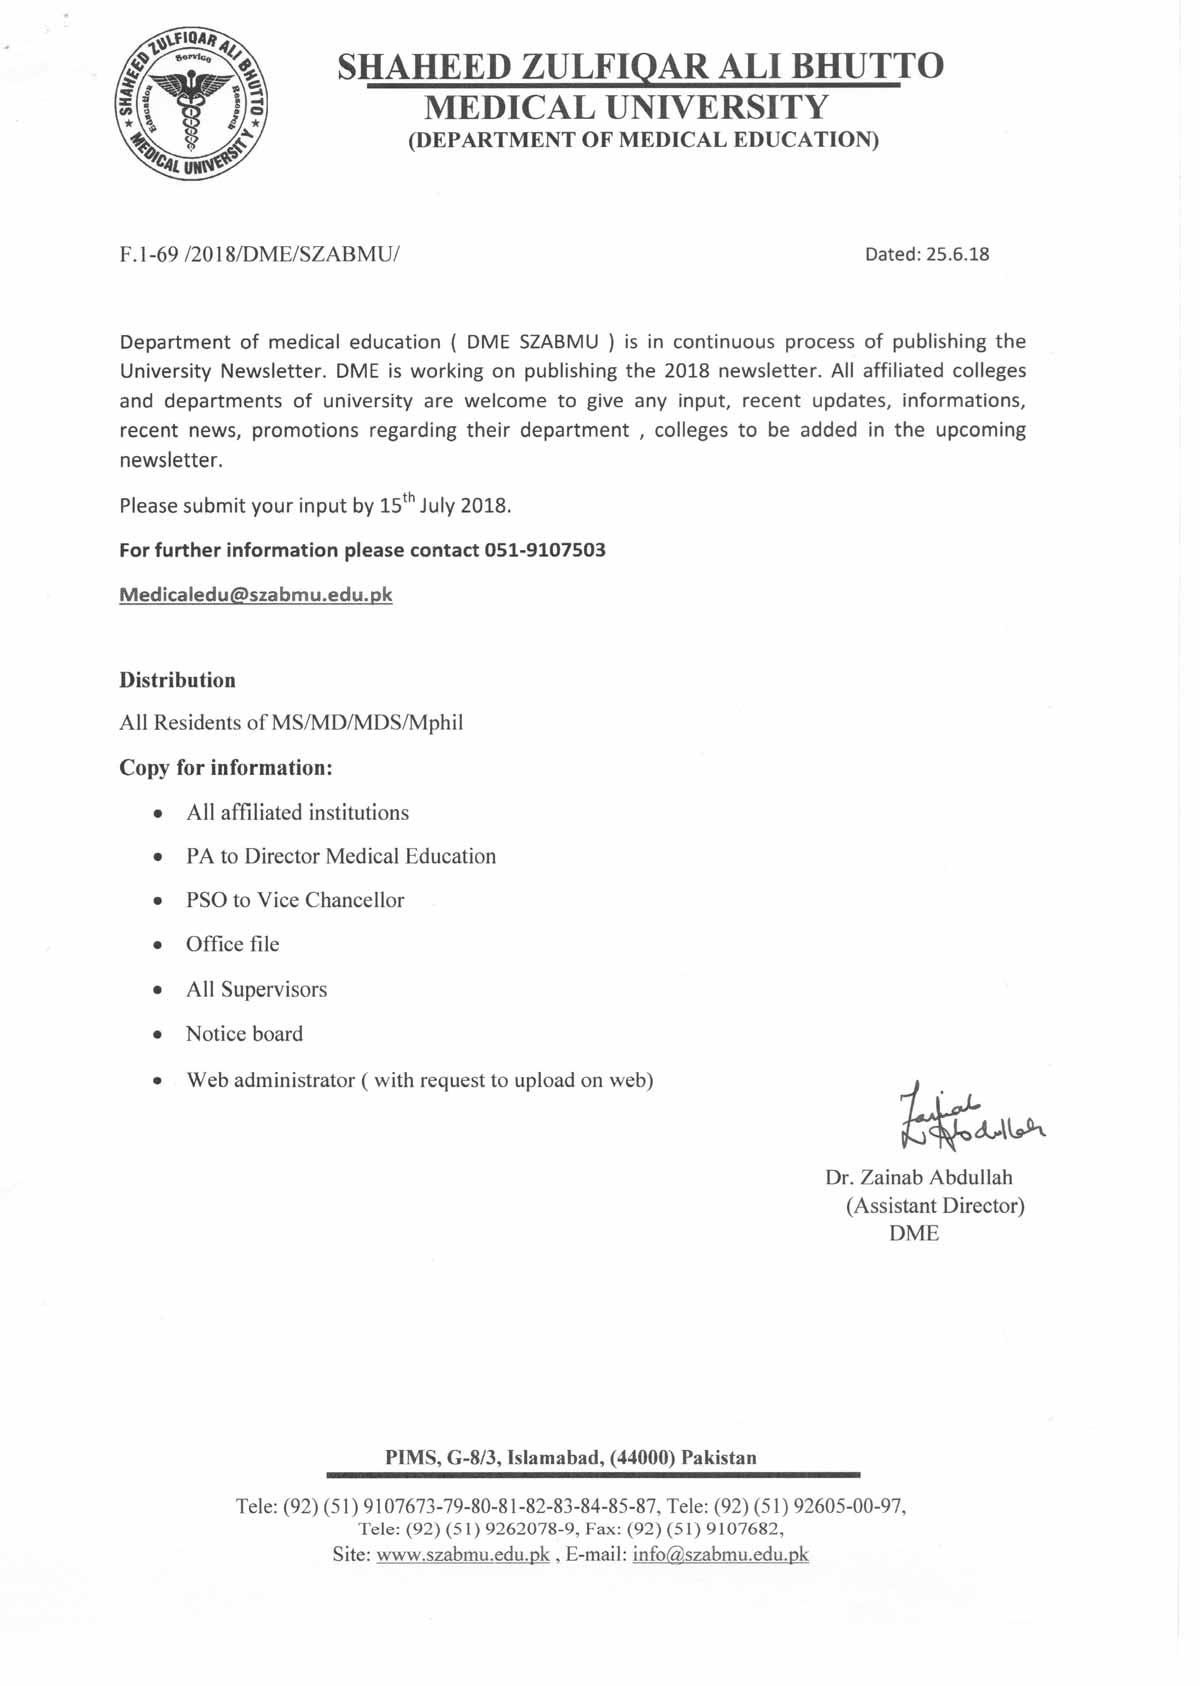 Publishing of University Newsletter